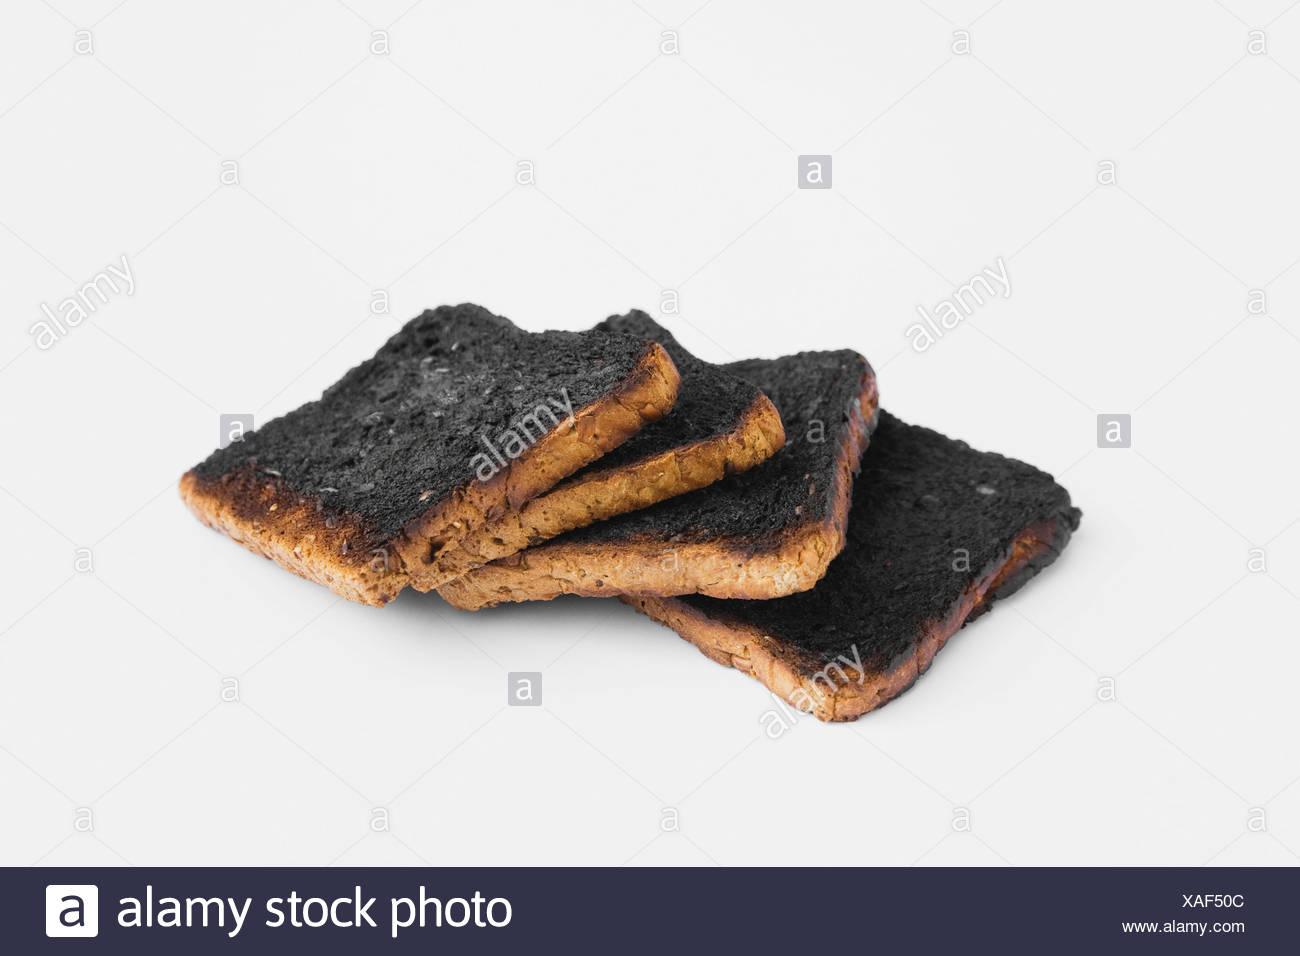 Burnt toast slices - Stock Image